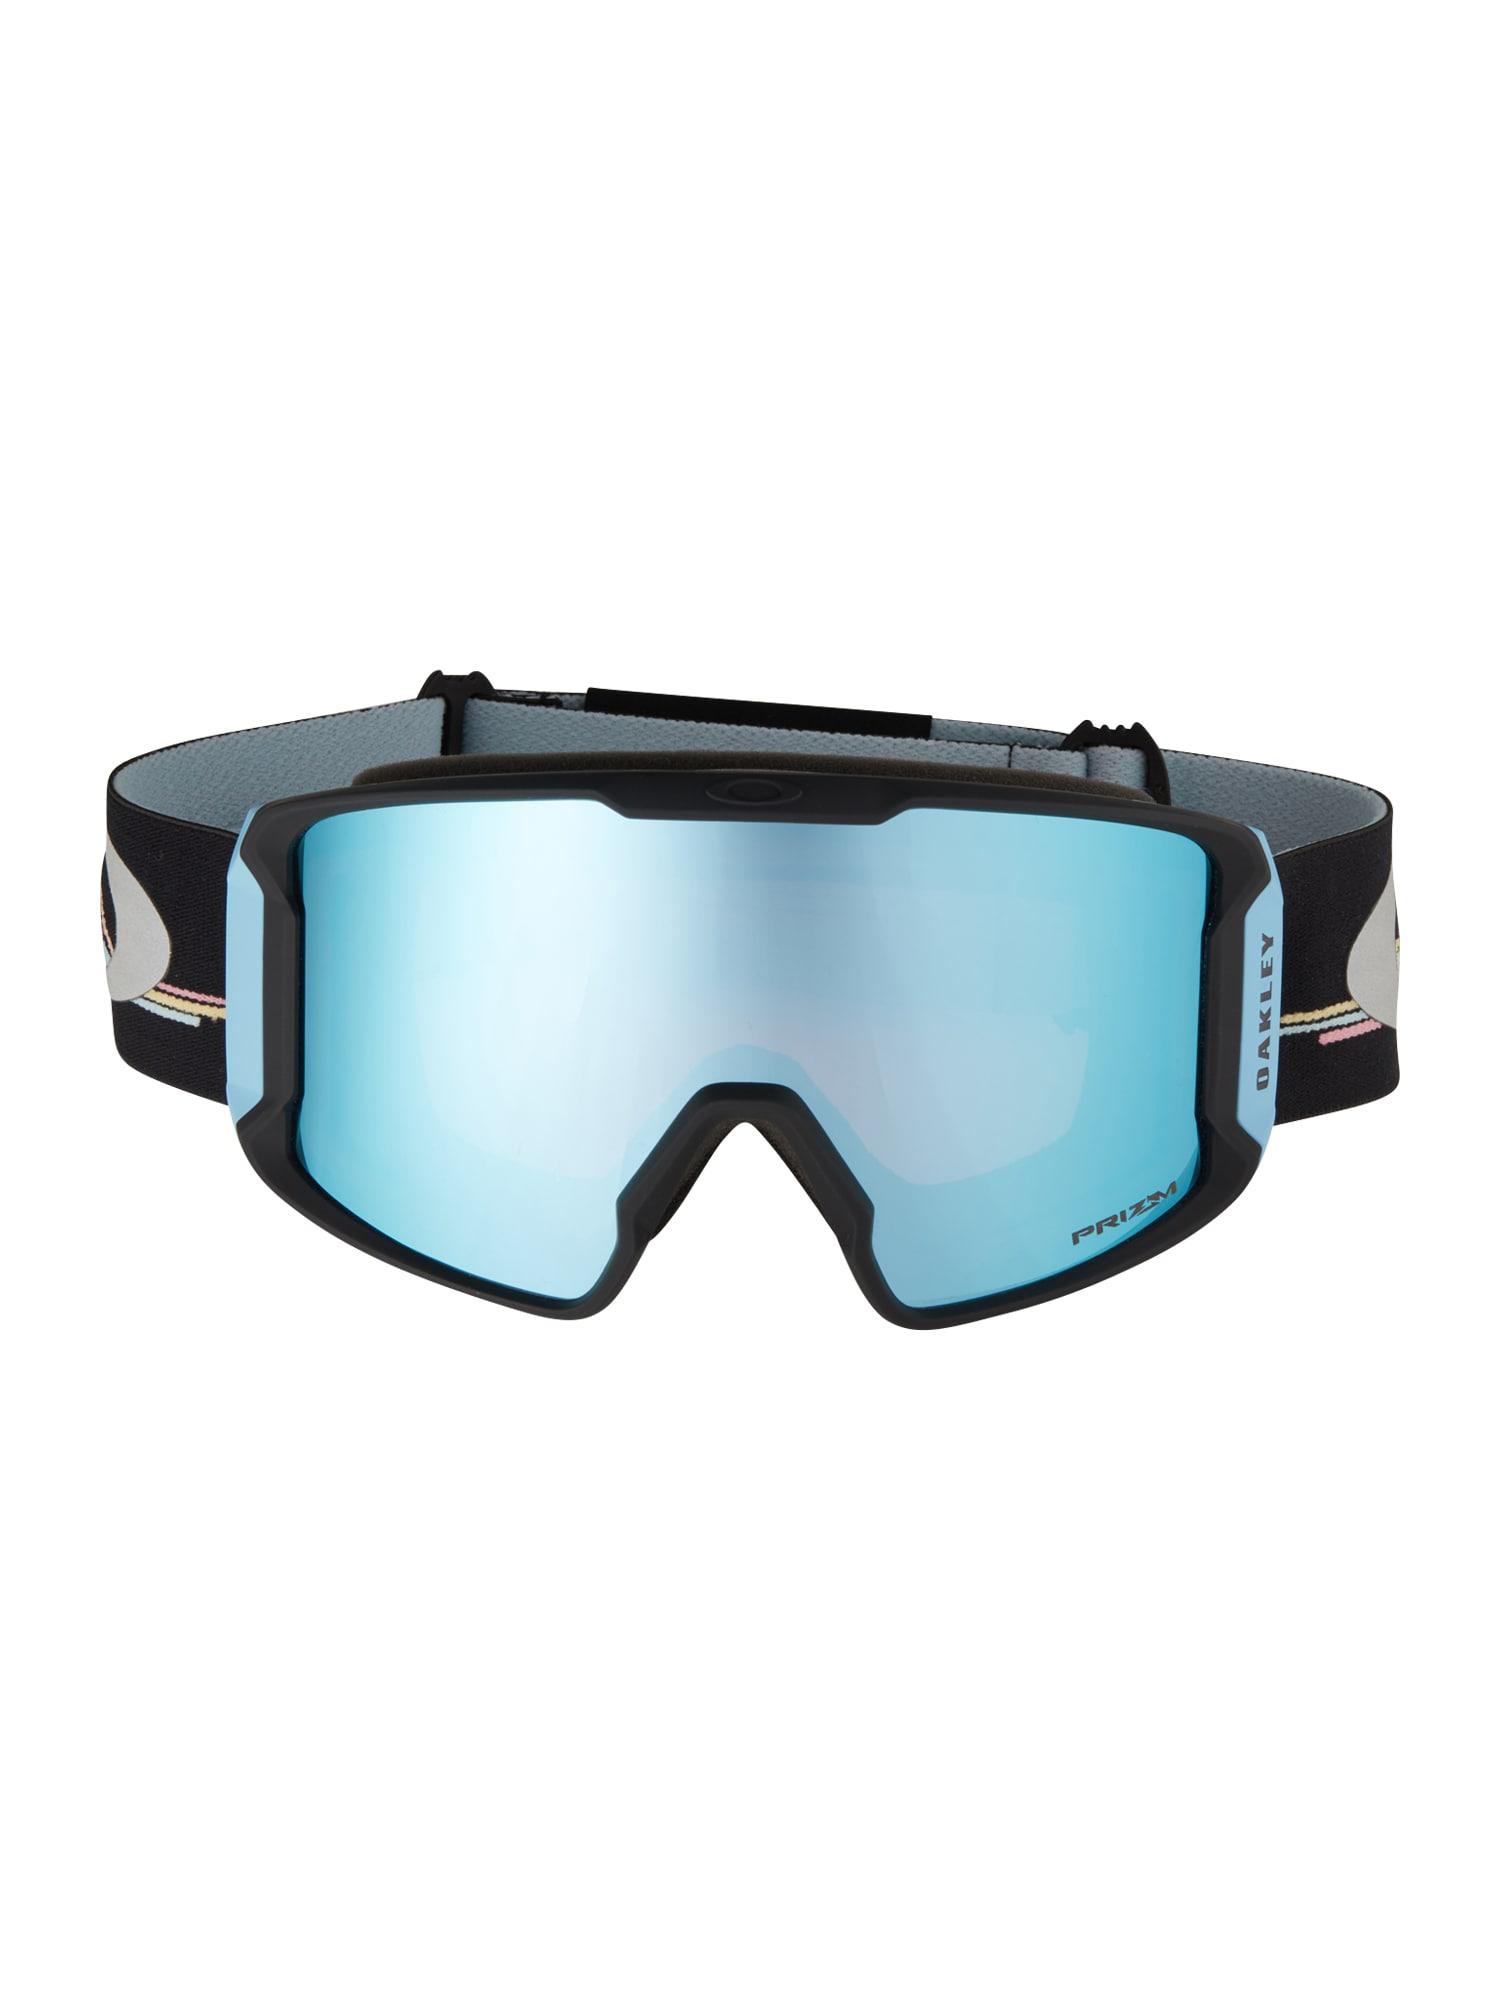 OAKLEY Sportiniai akiniai 'Line Miner L' safyro / juoda